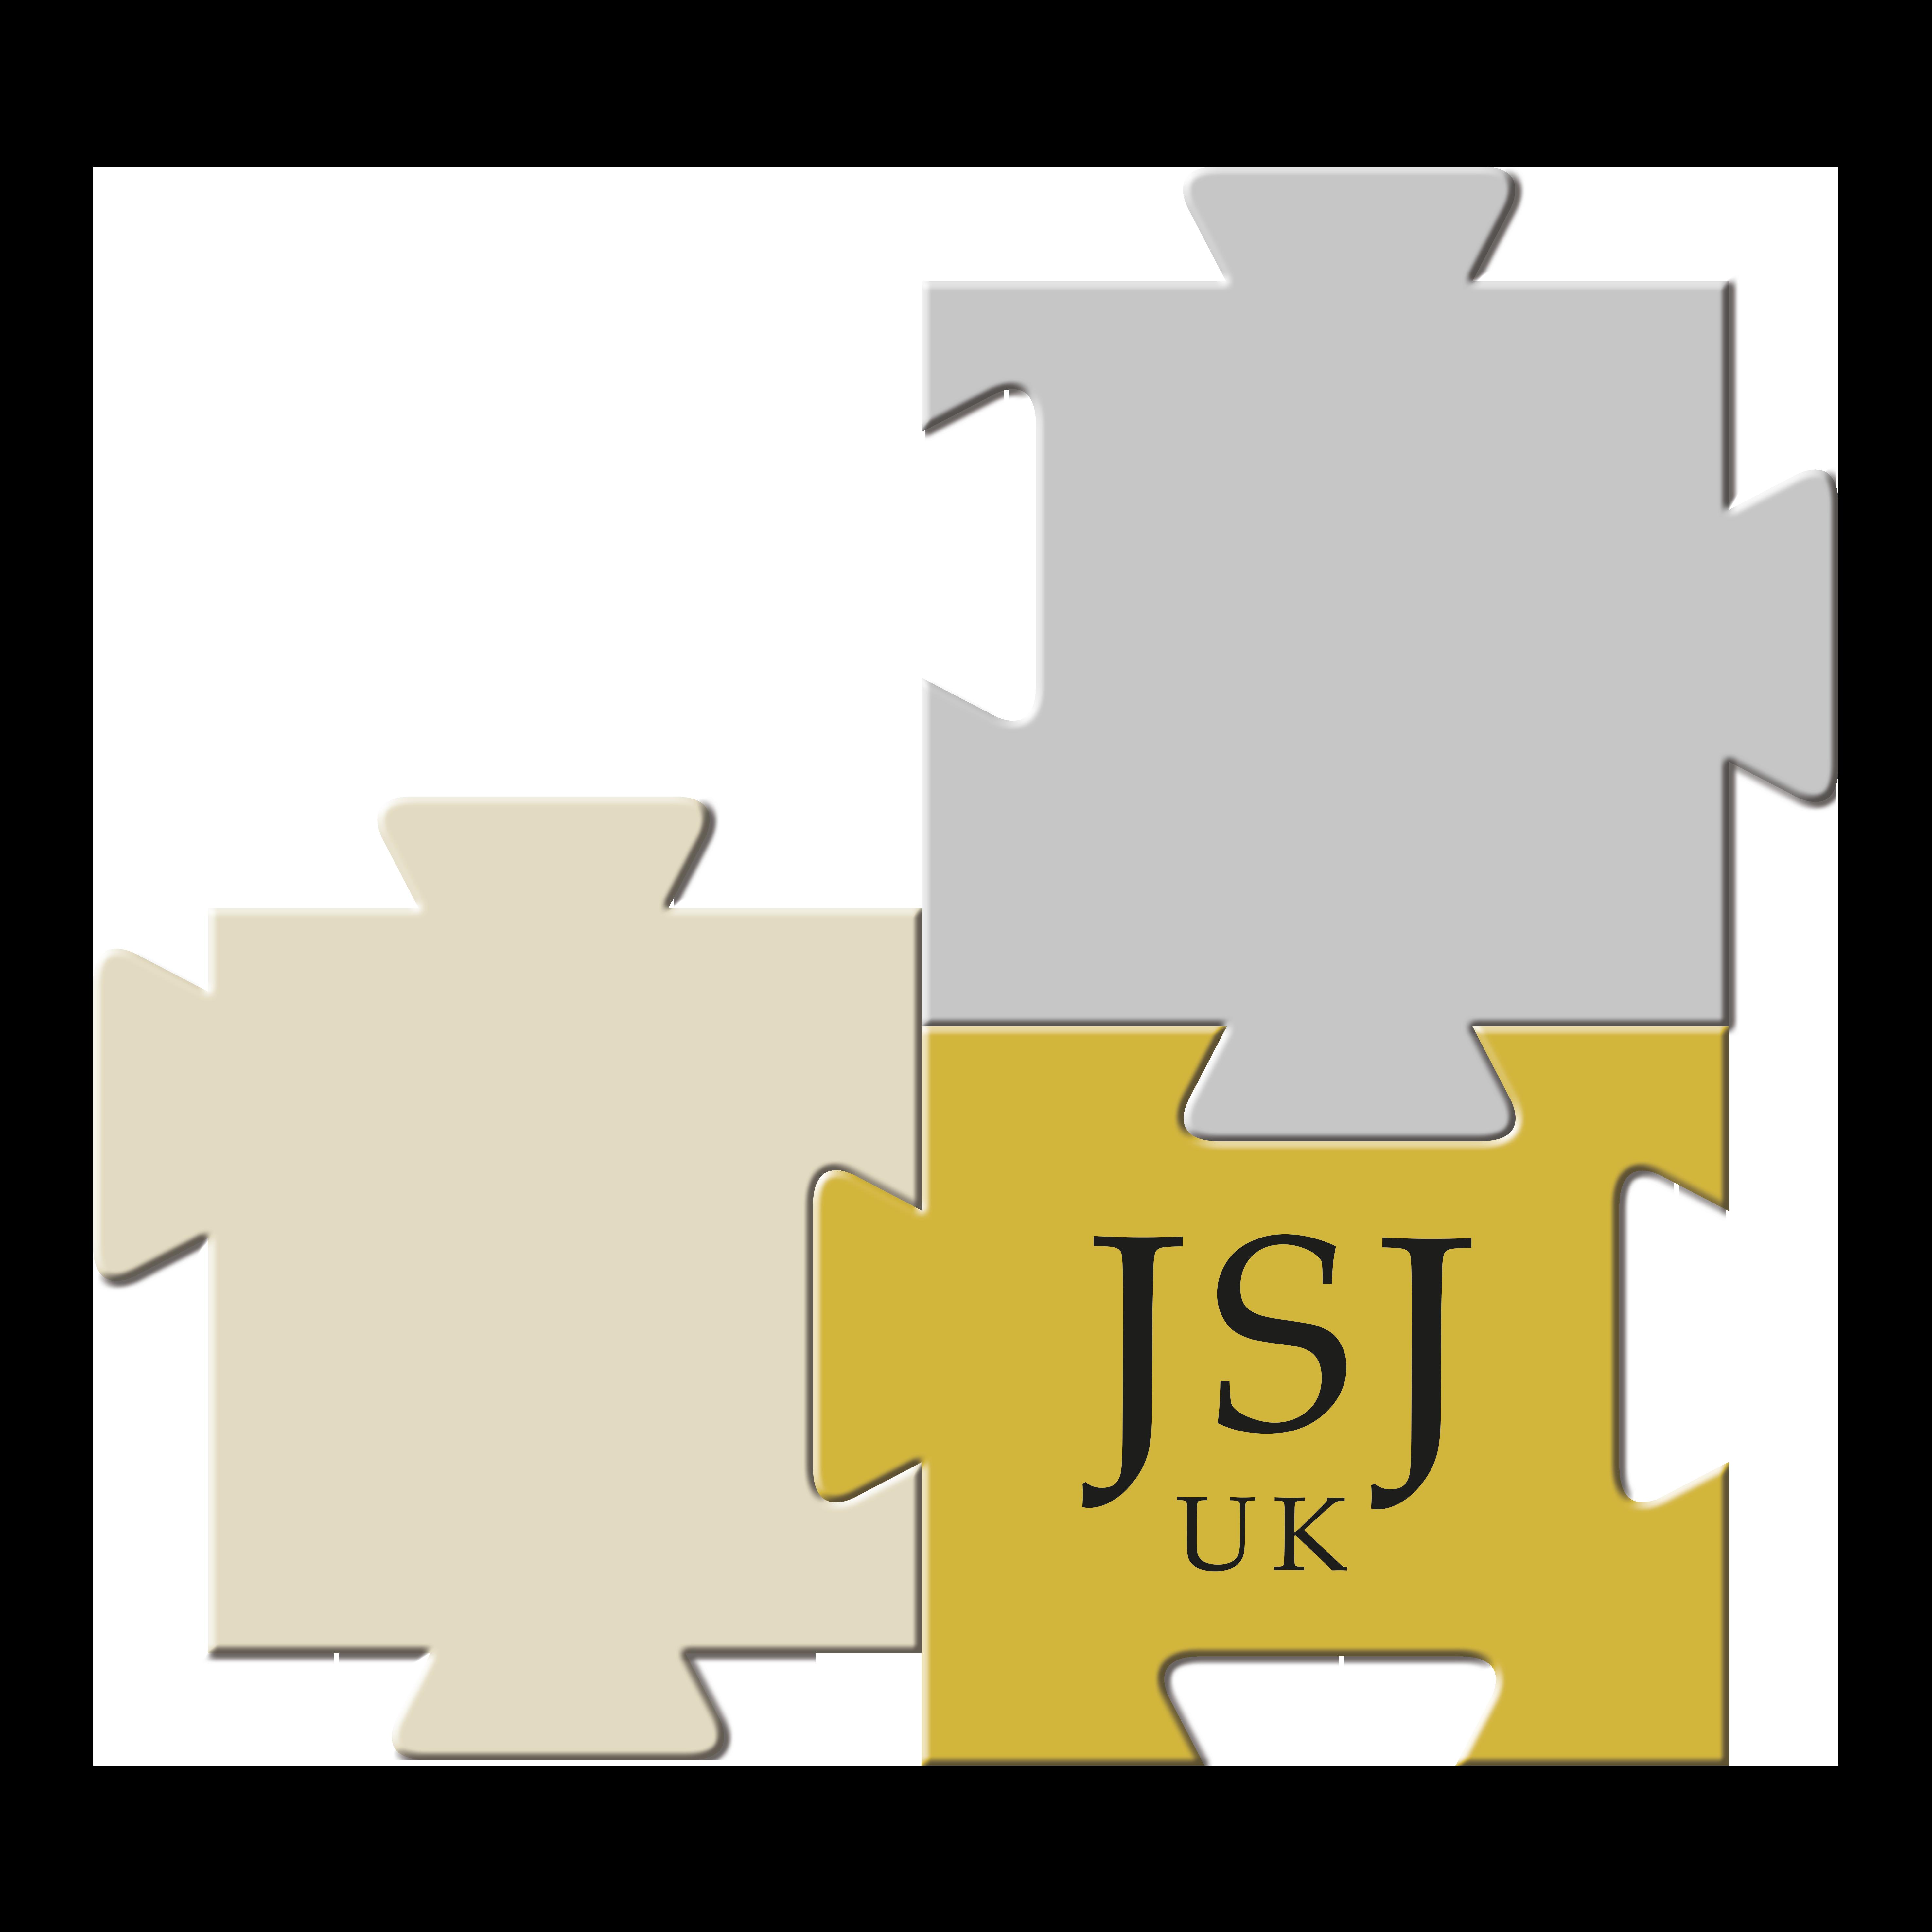 JSJ UK Logo